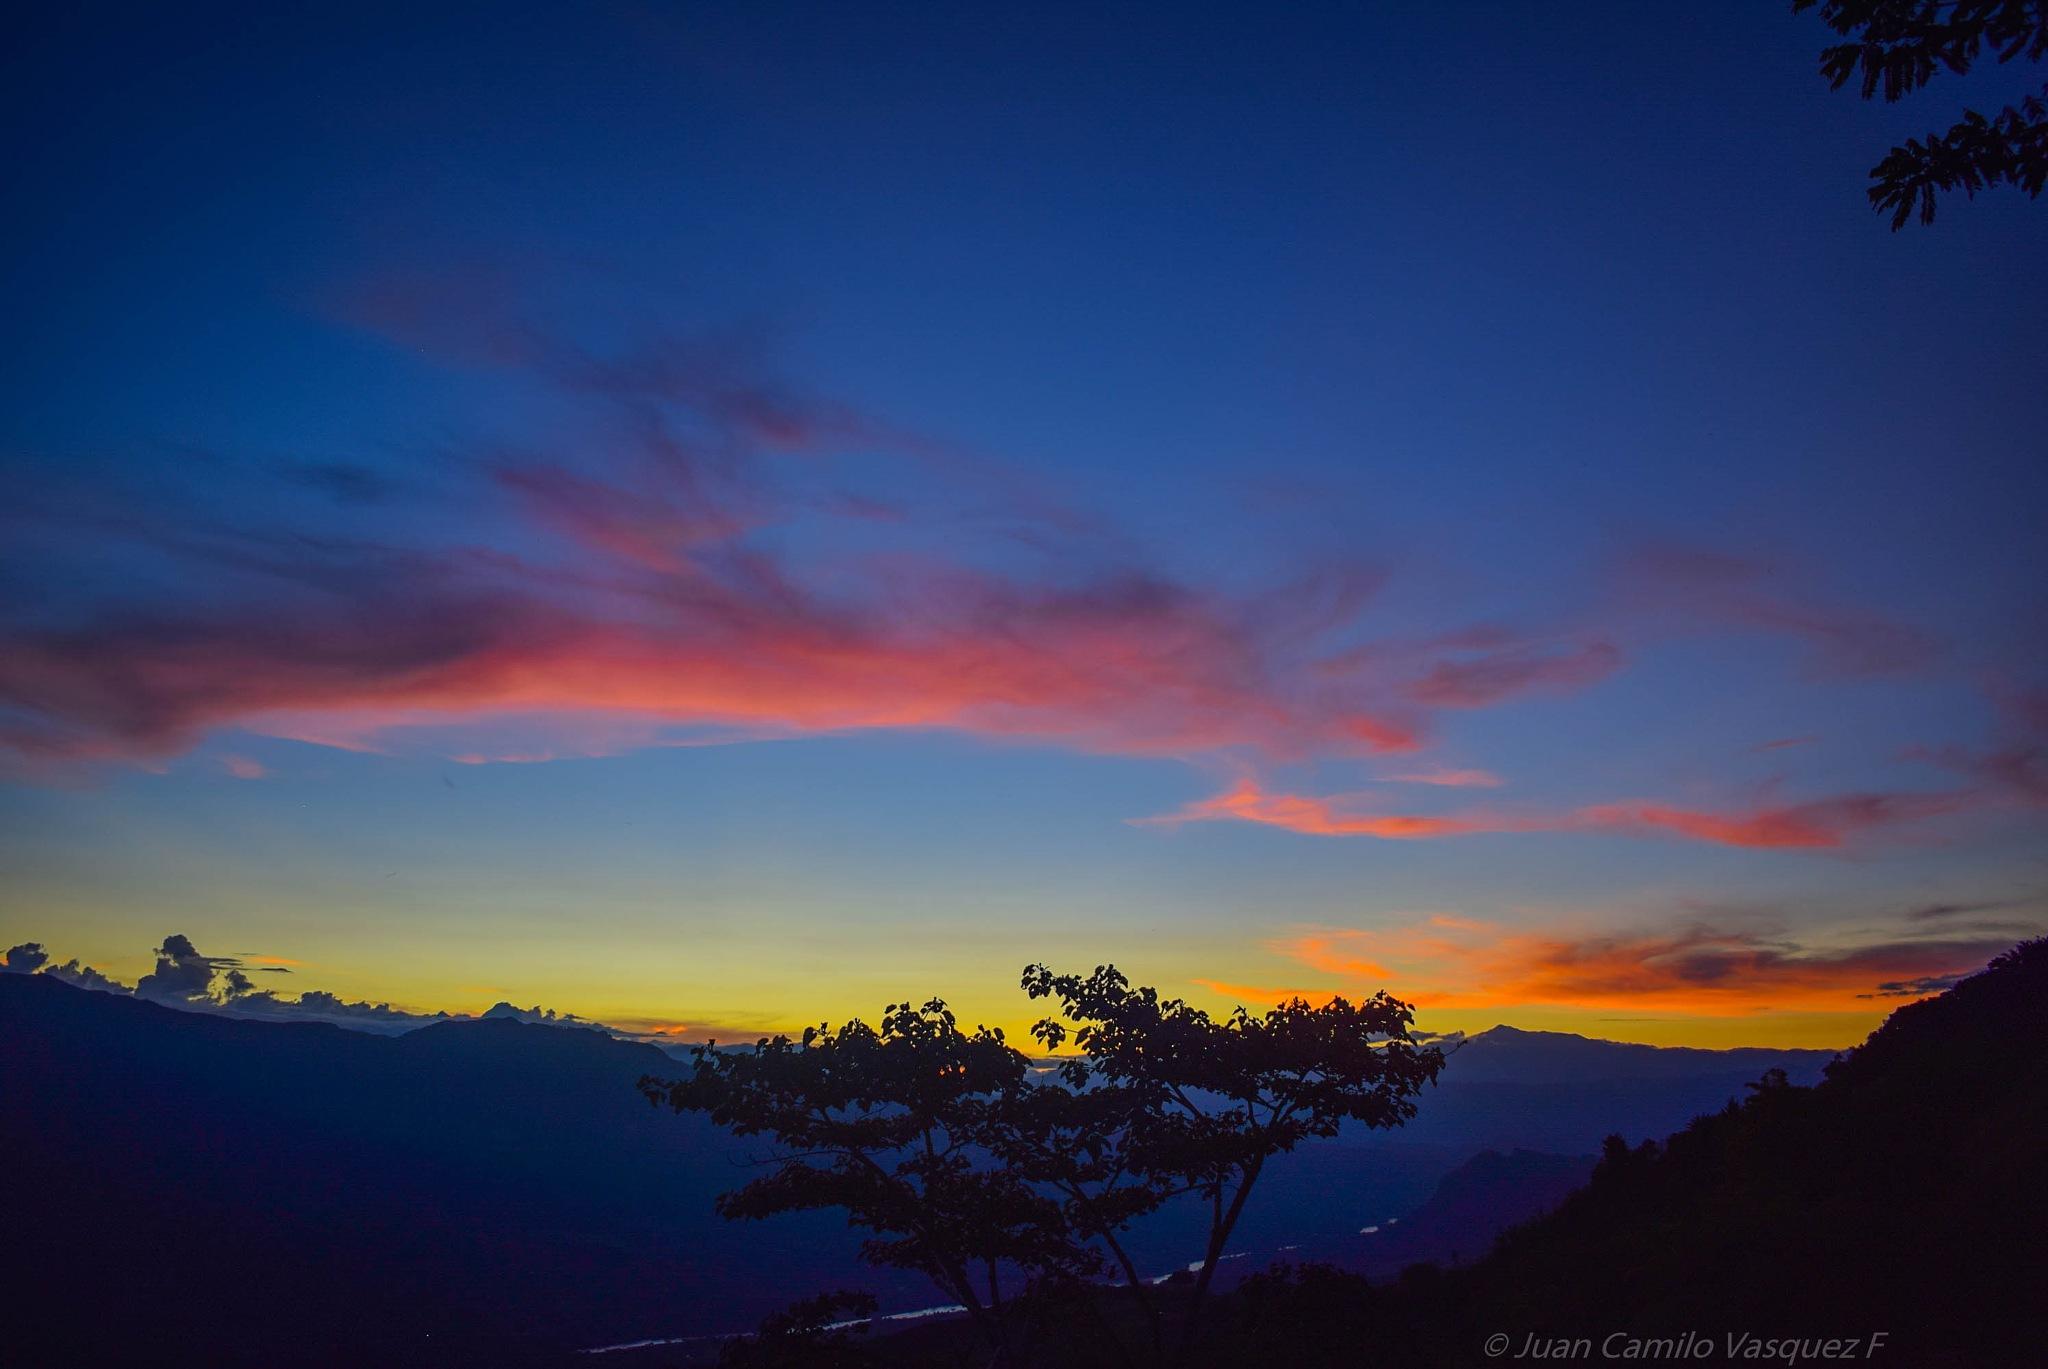 Sunset by Juan Camilo Vasquez Fernandez